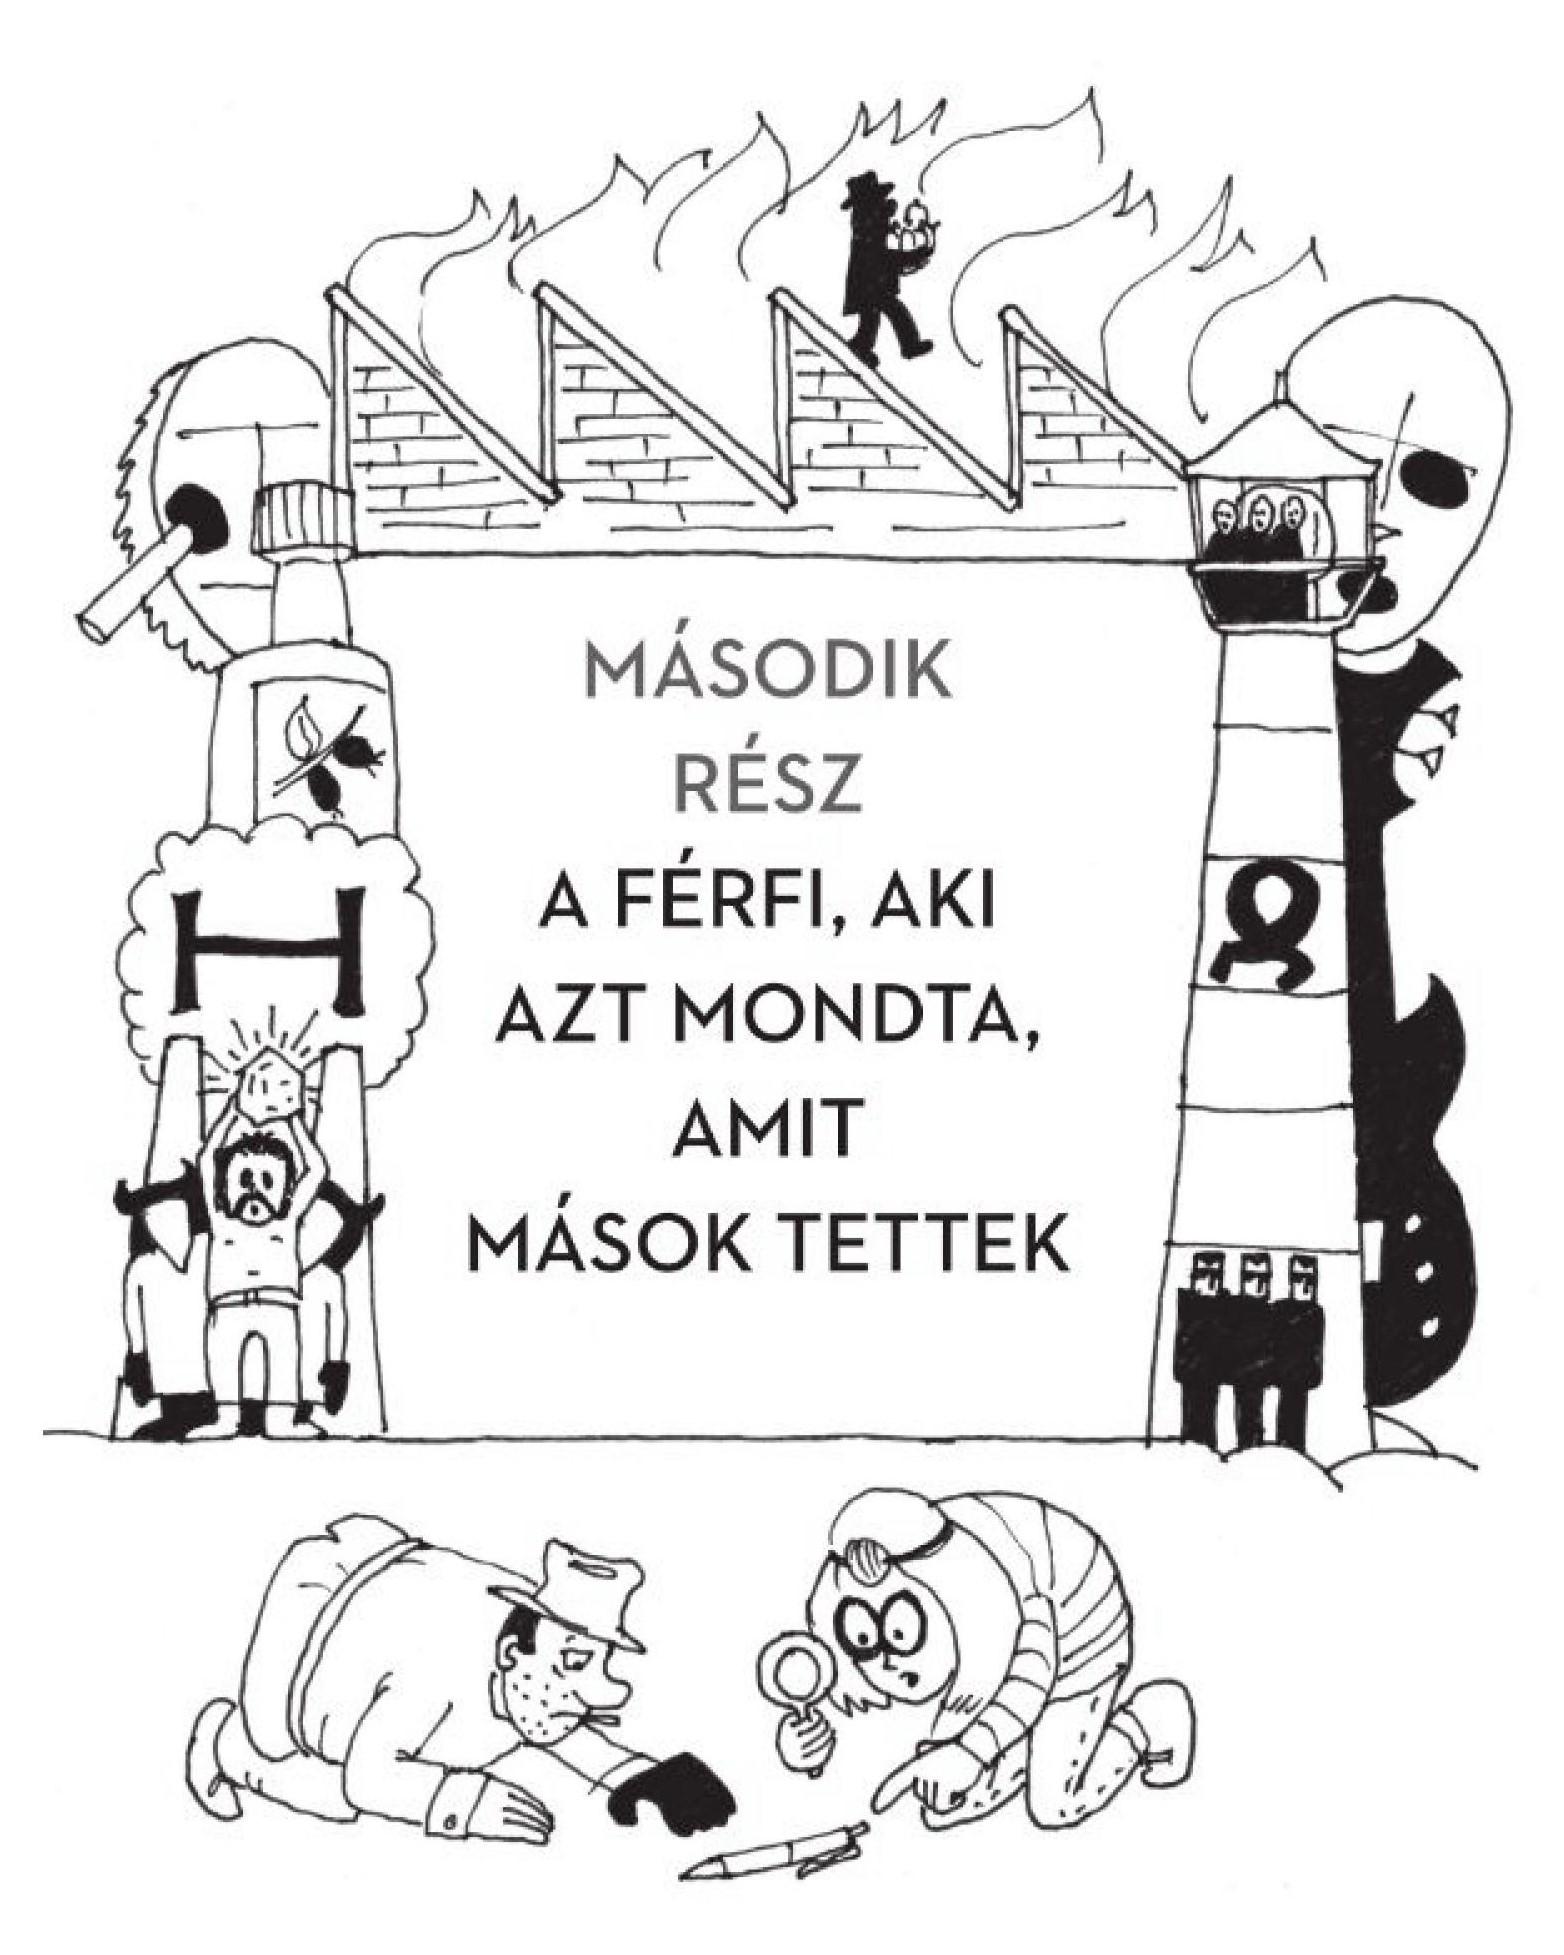 masodik_resz.jpg